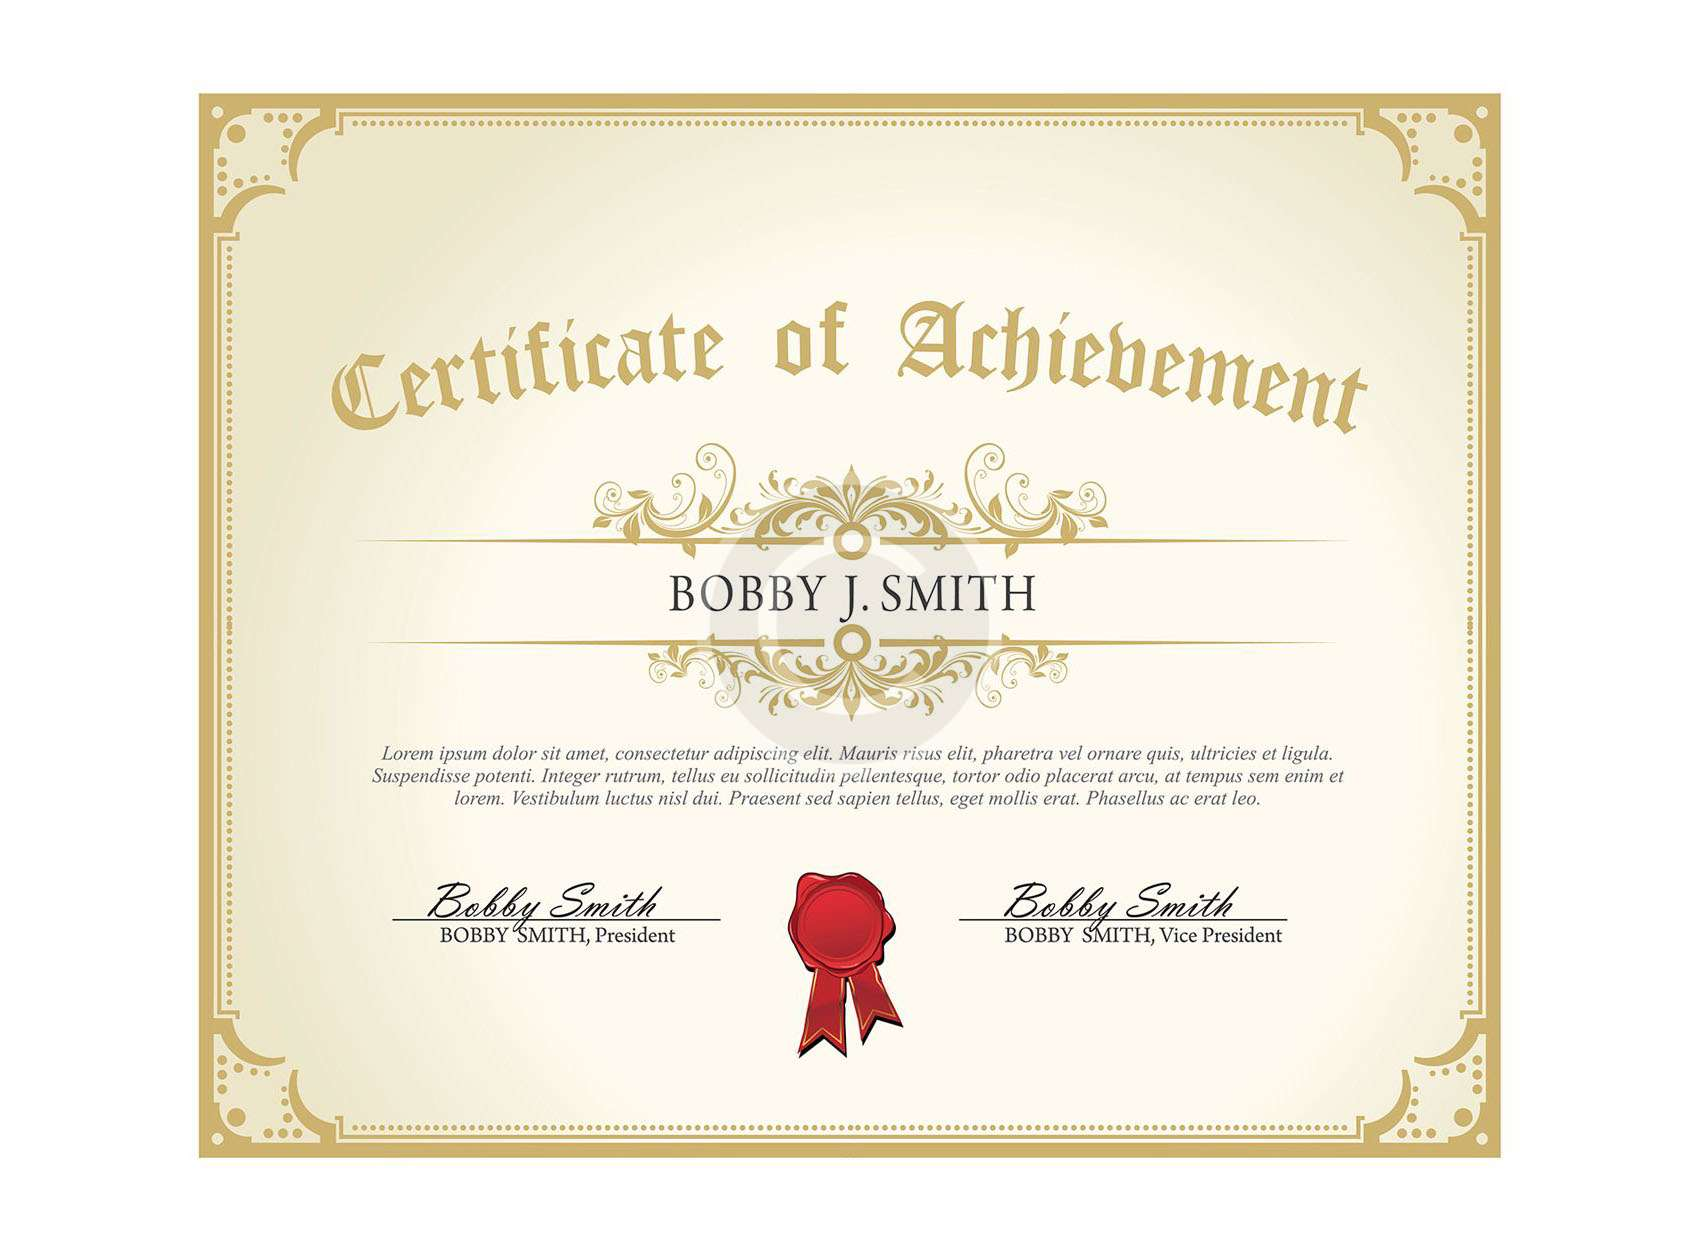 certificate4.jpg?fit=1700%2C1250&s